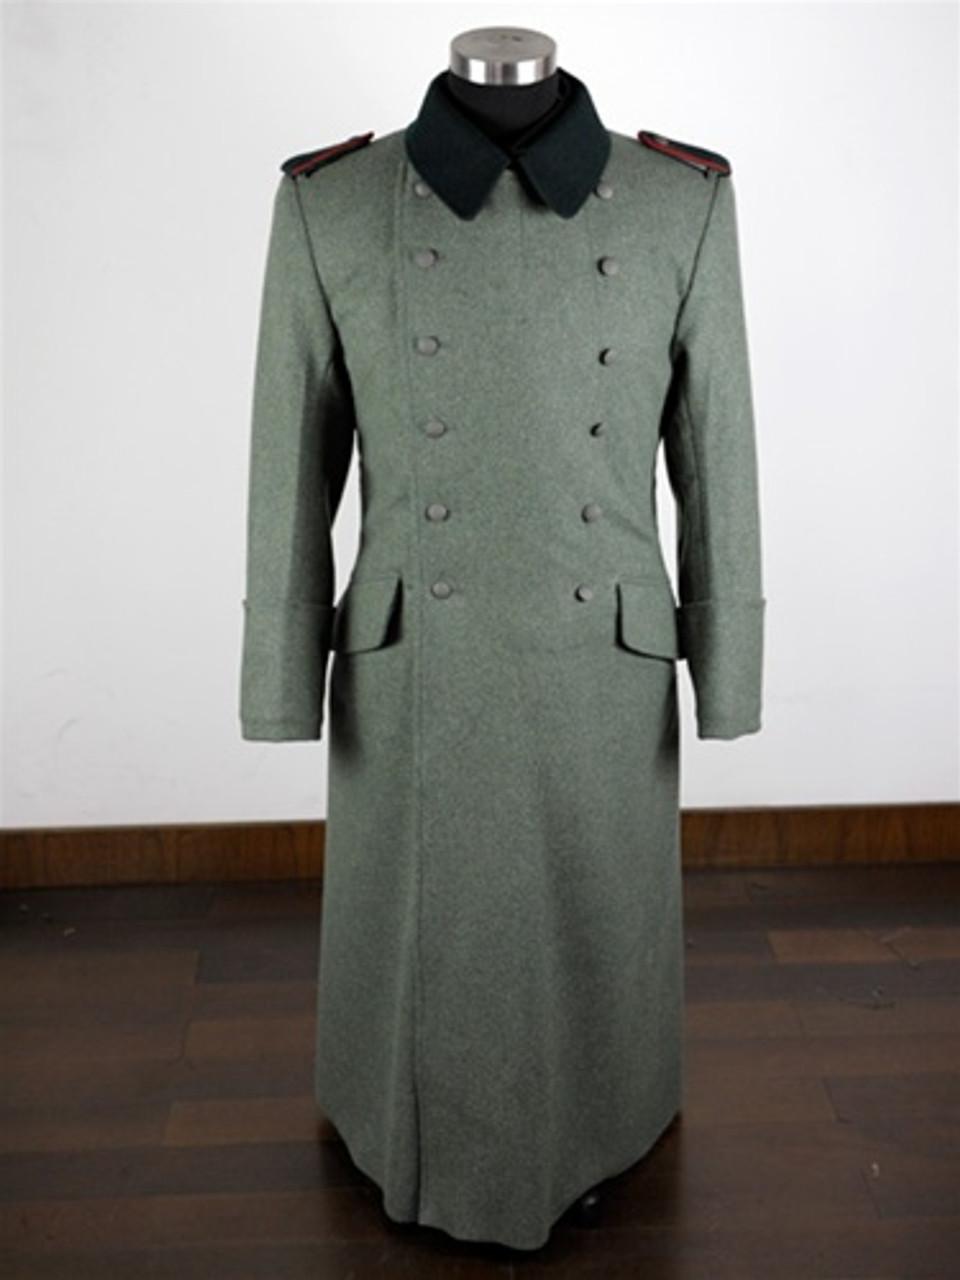 M37 Greatcoat from Hessen Antique